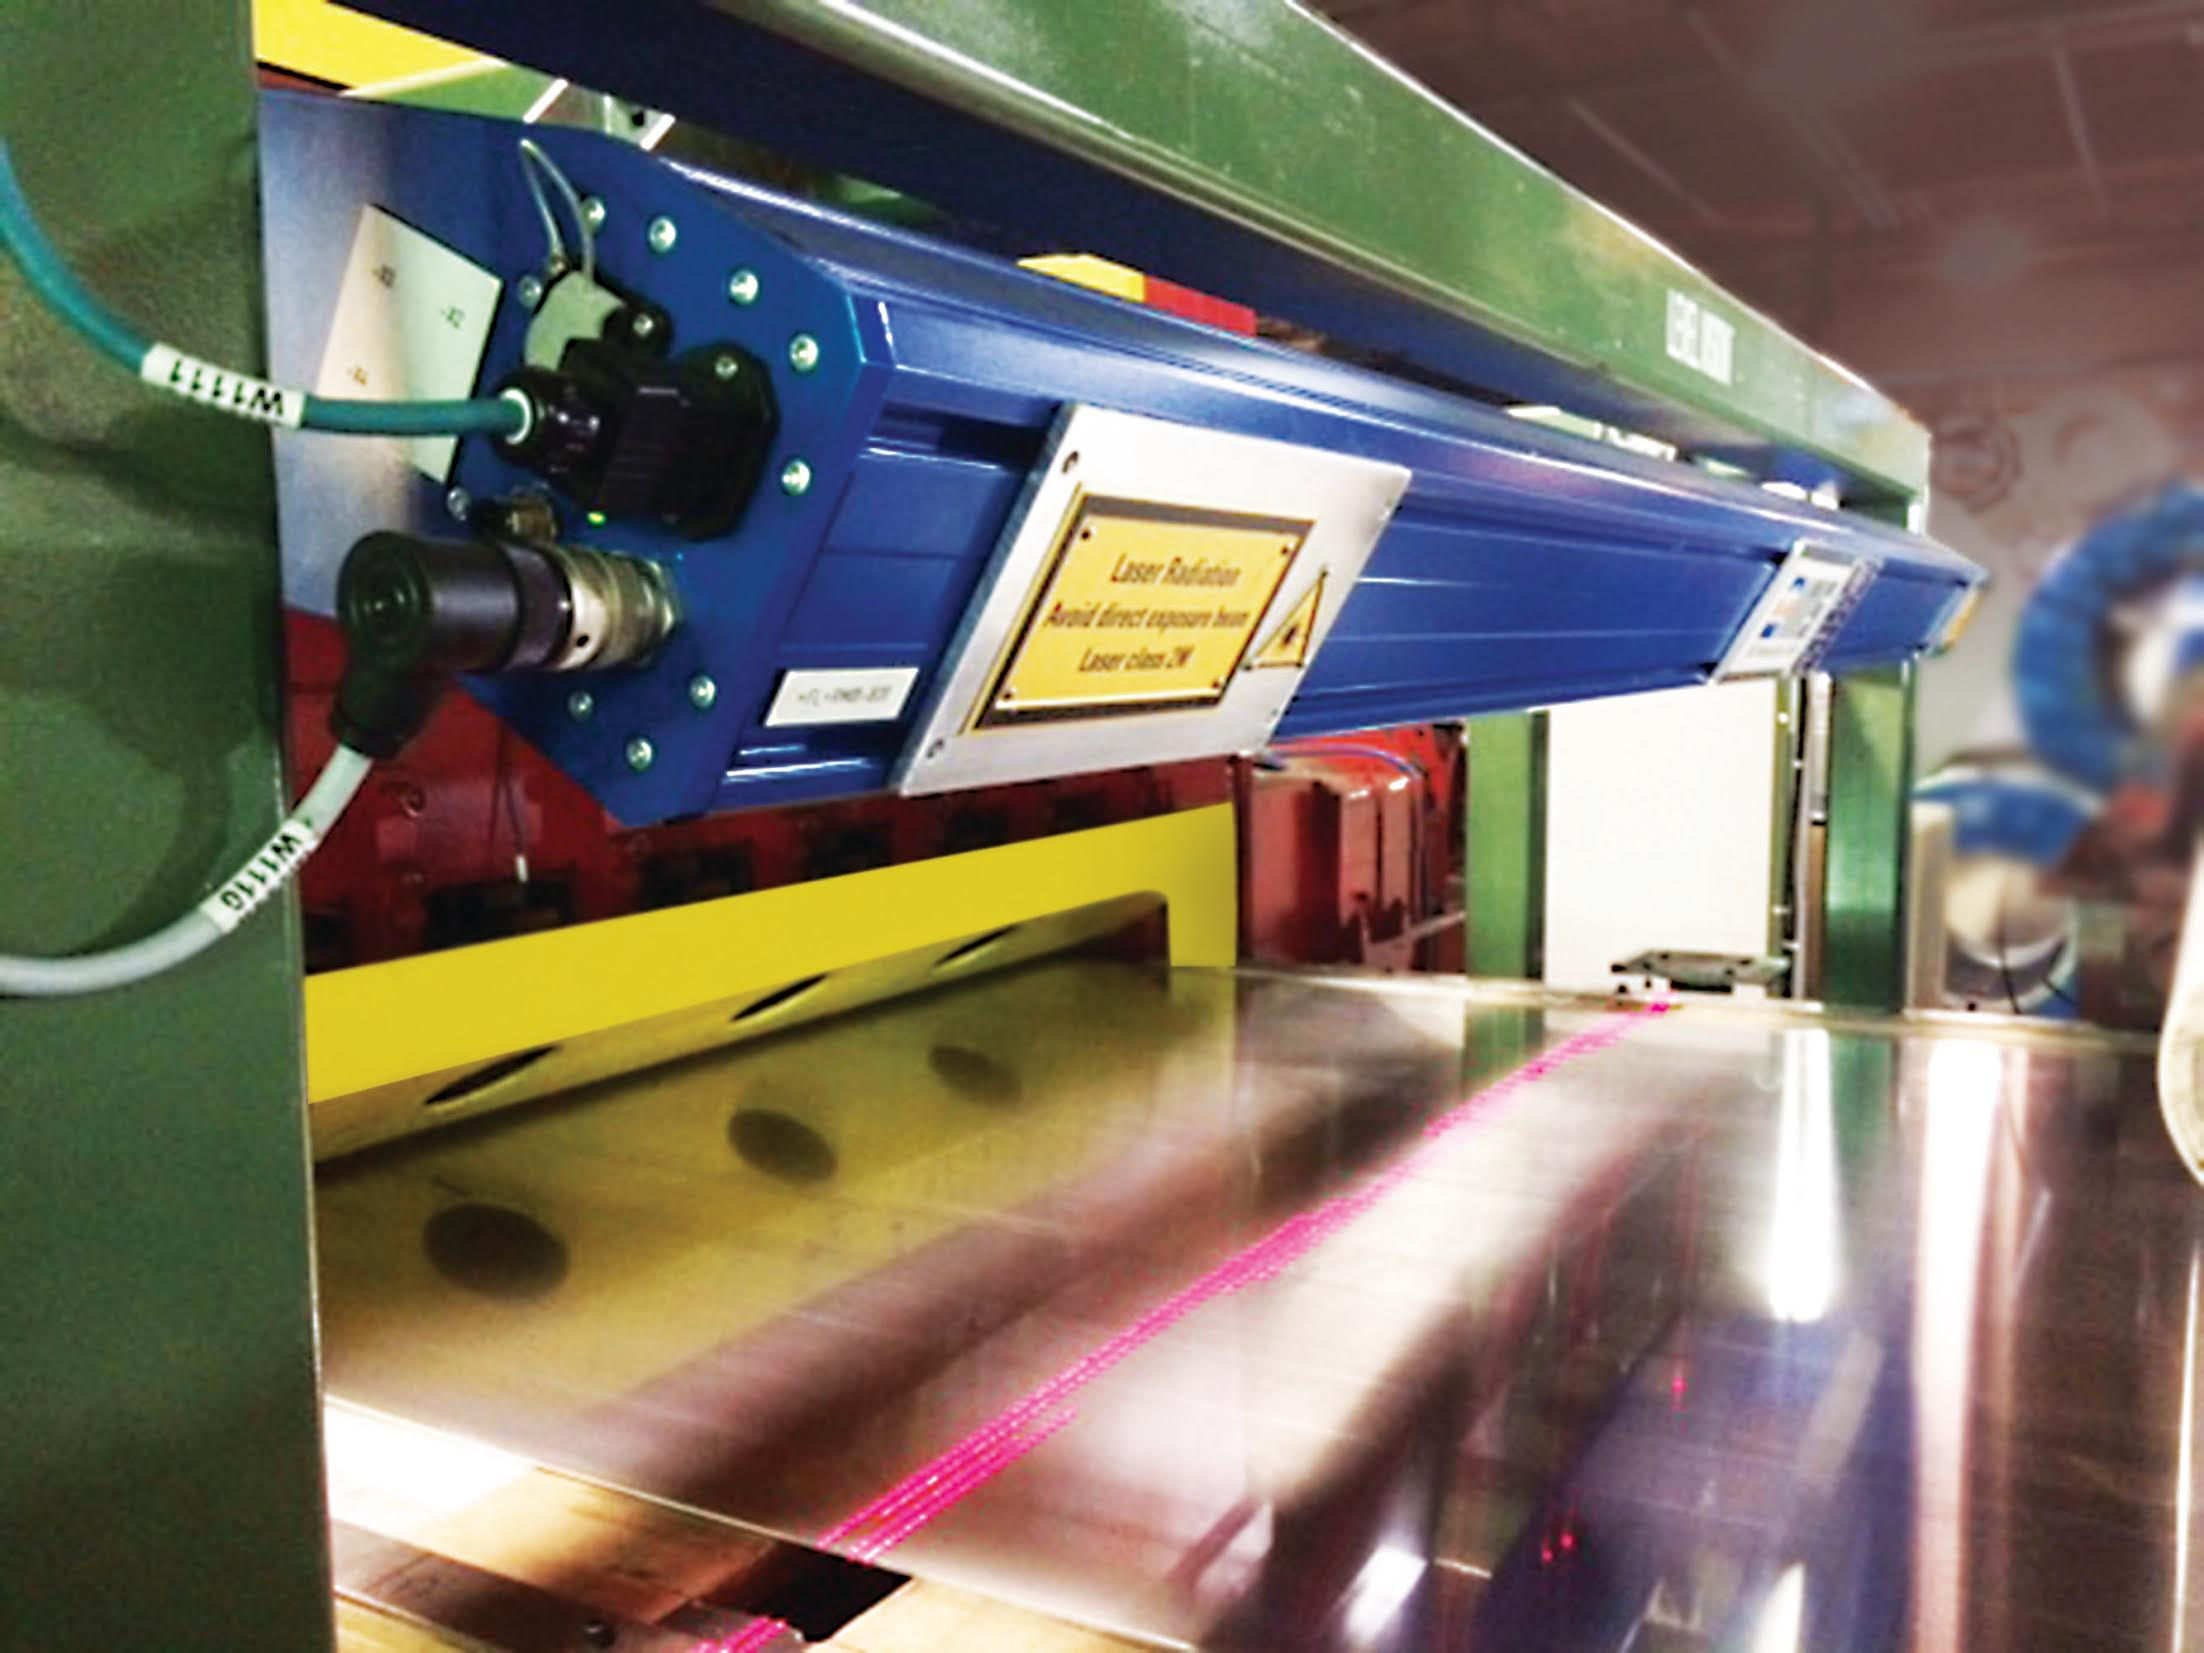 Flatness_Gauge_Photo_for_Modern_Metals_Company_Description.jpg